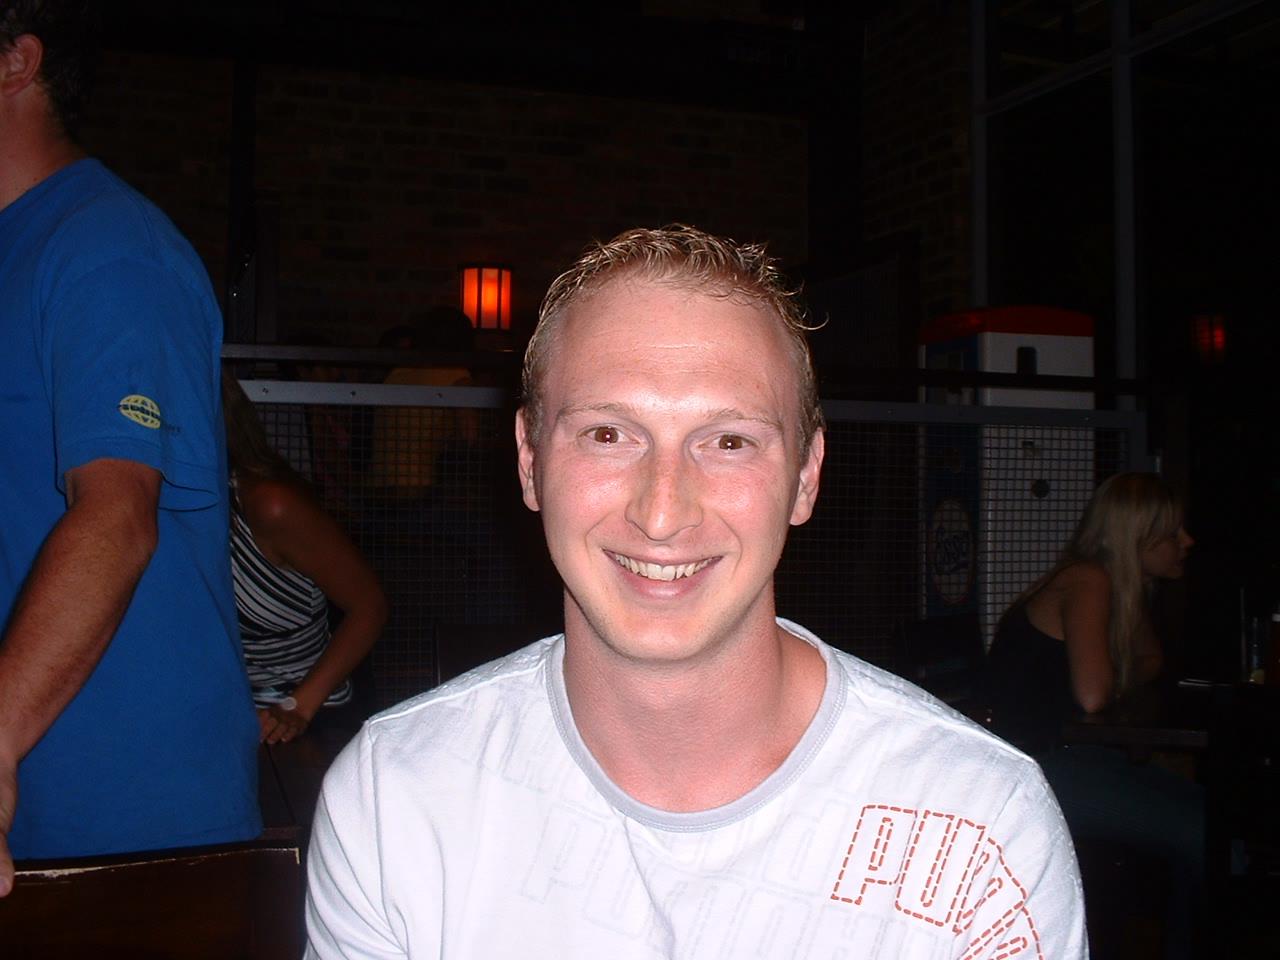 Dr. Anthony Koller